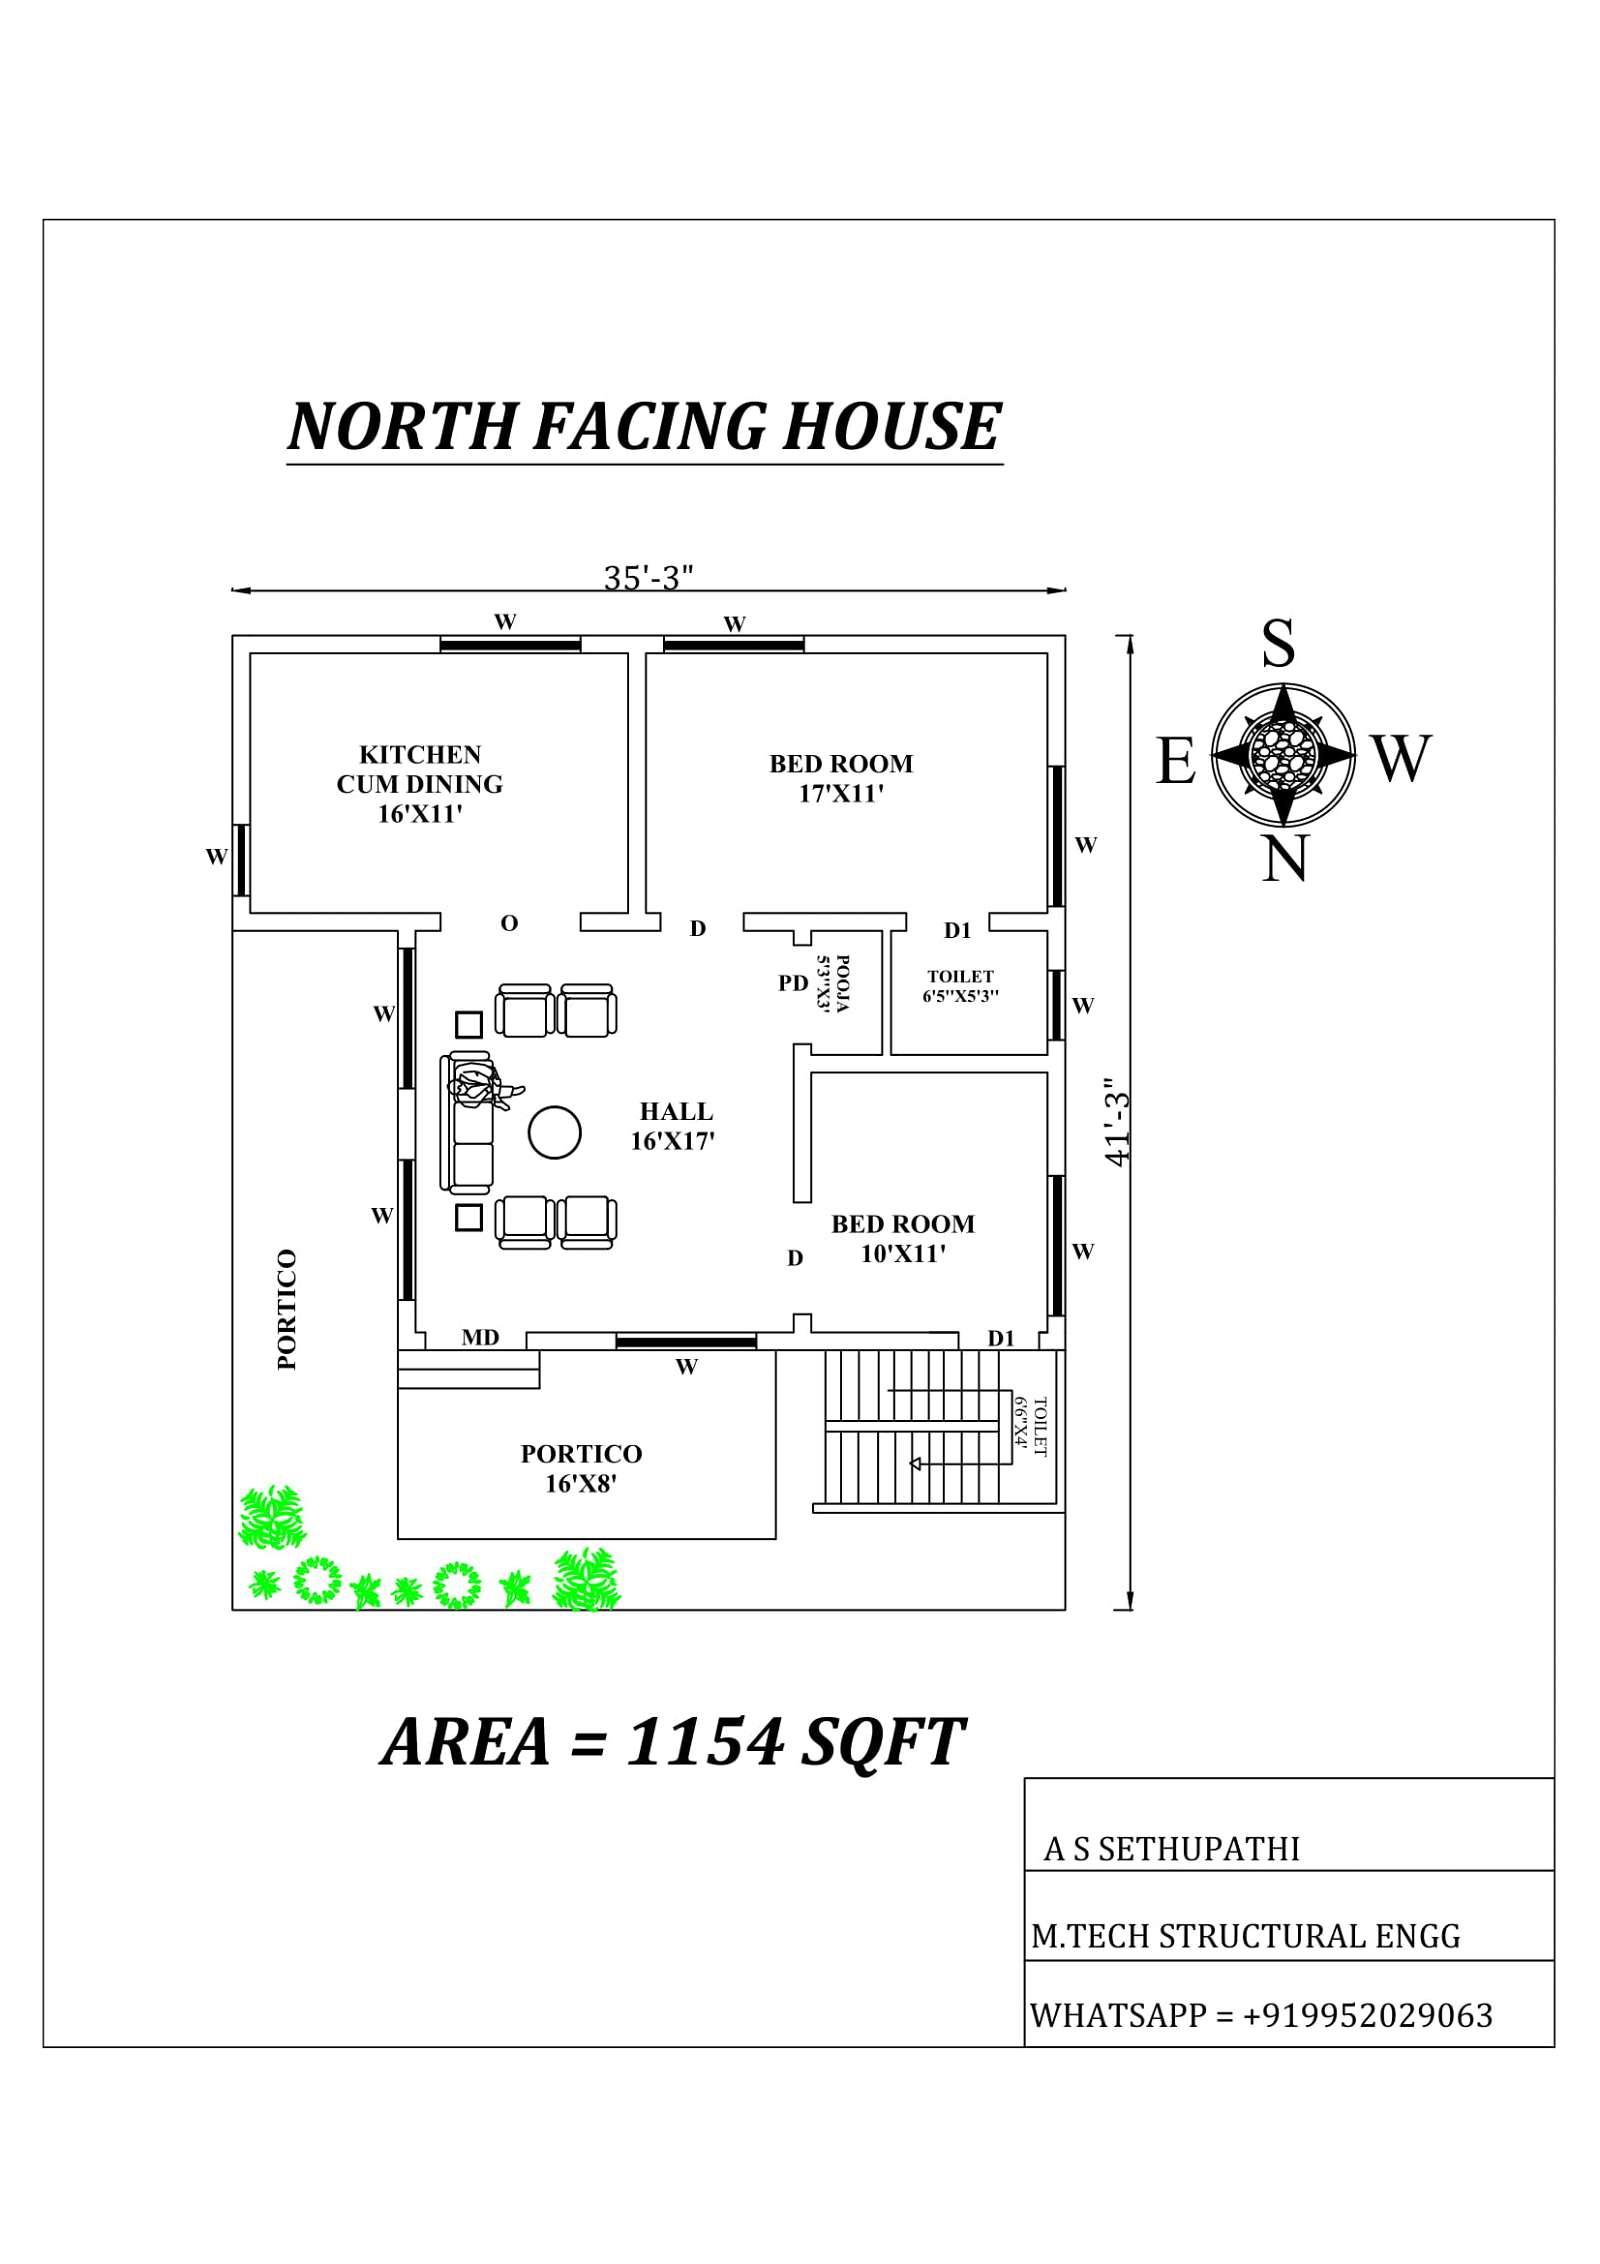 north facing house plan as per vastu shastra cadbull